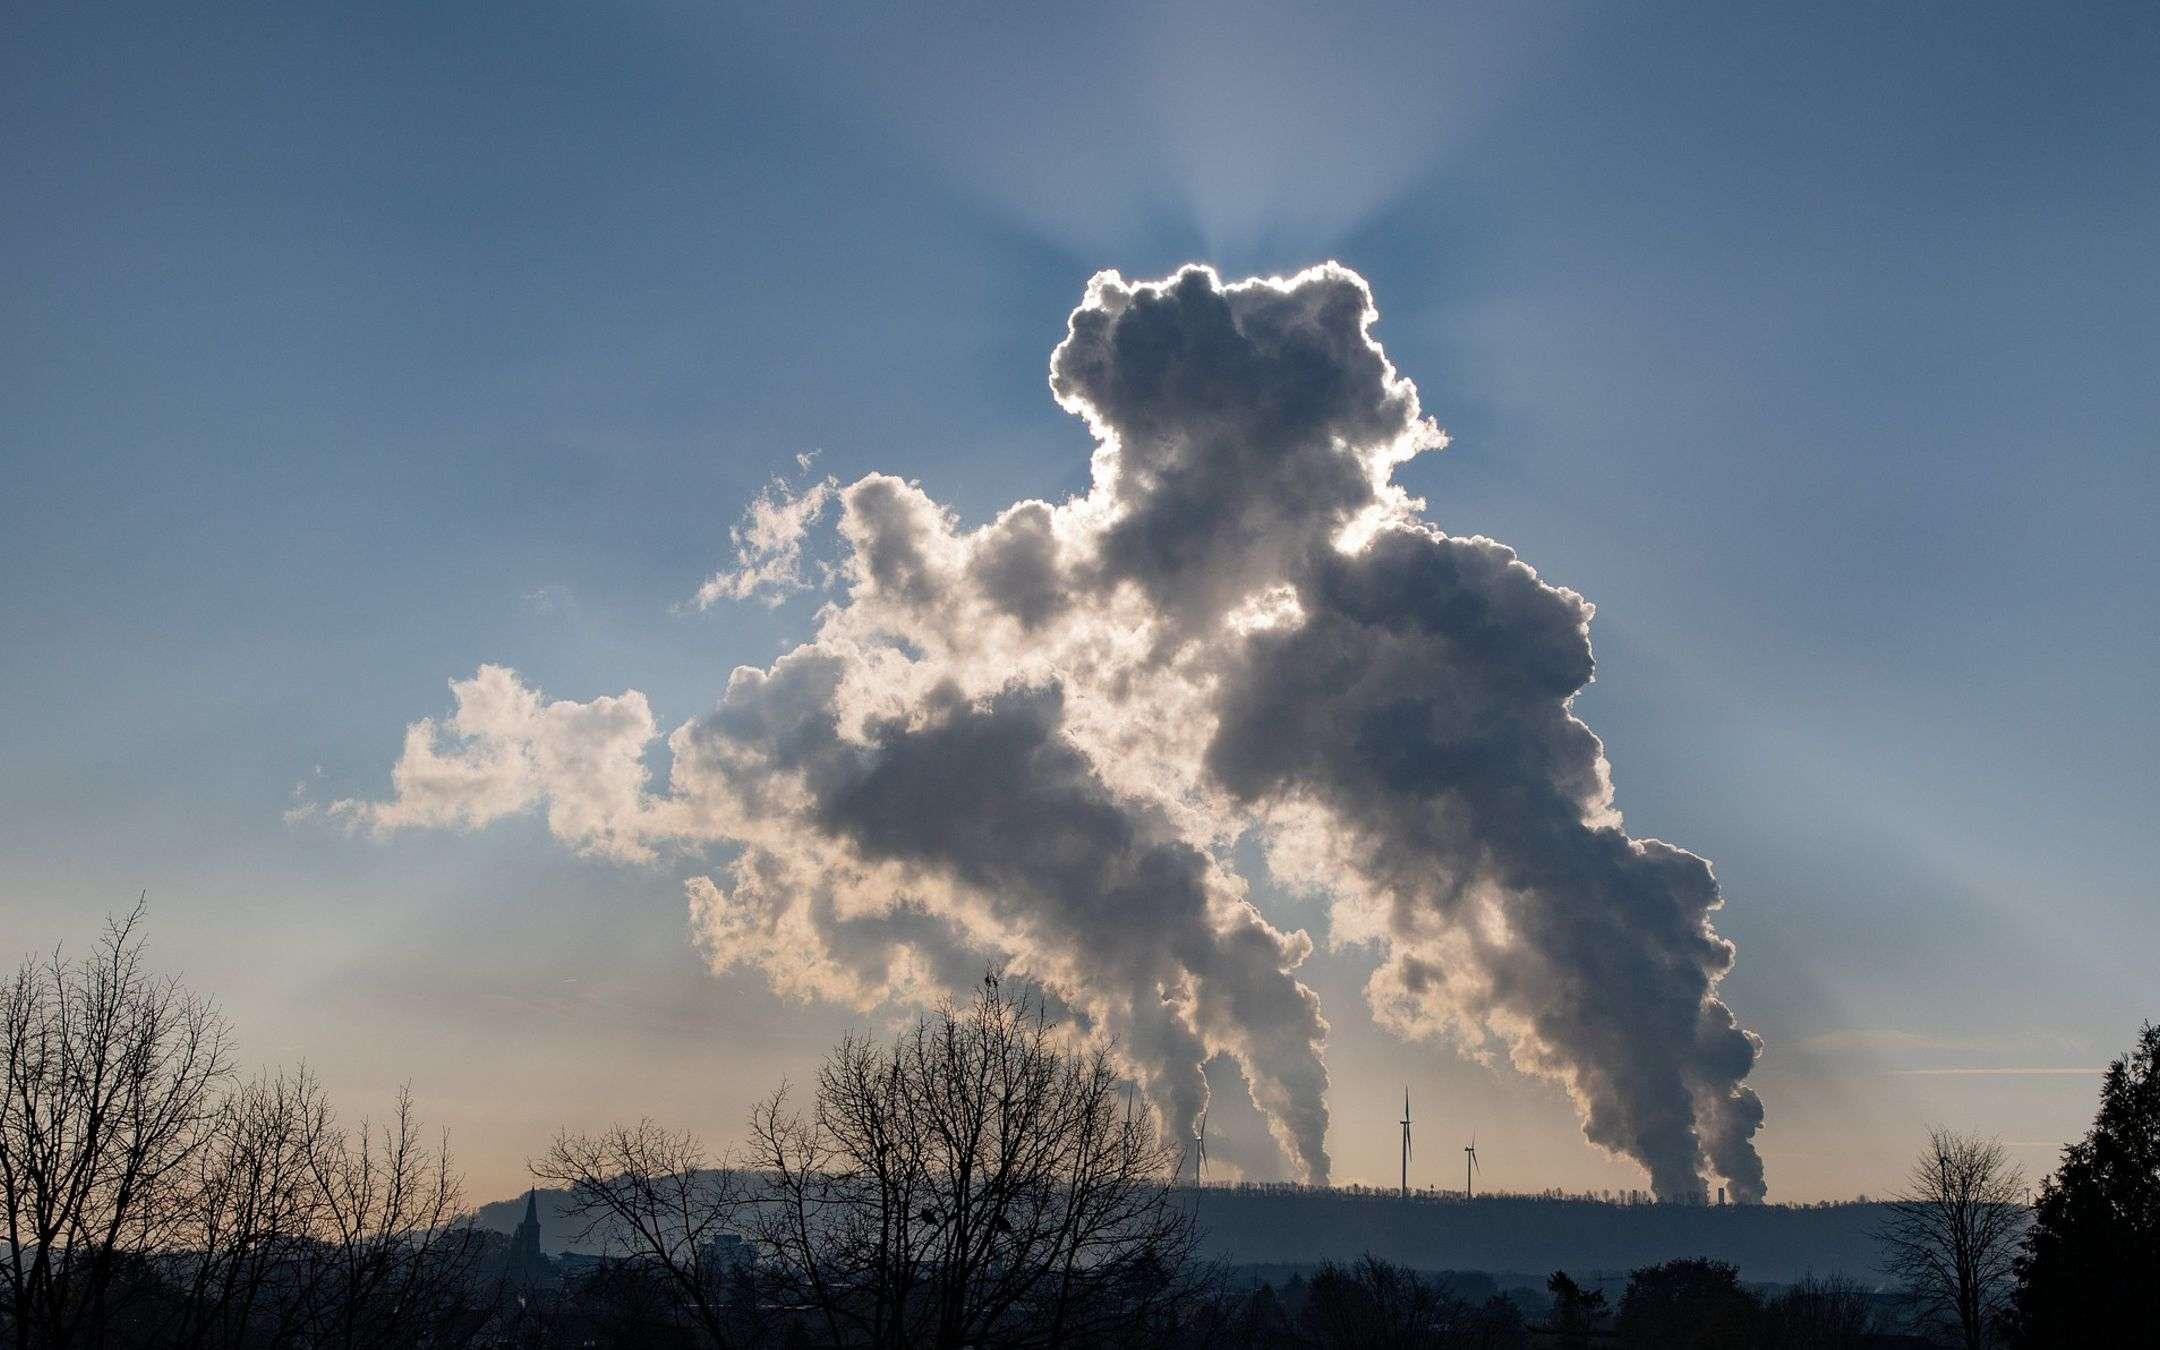 CO2, storage and reuse: the Eni-Saipem agreement